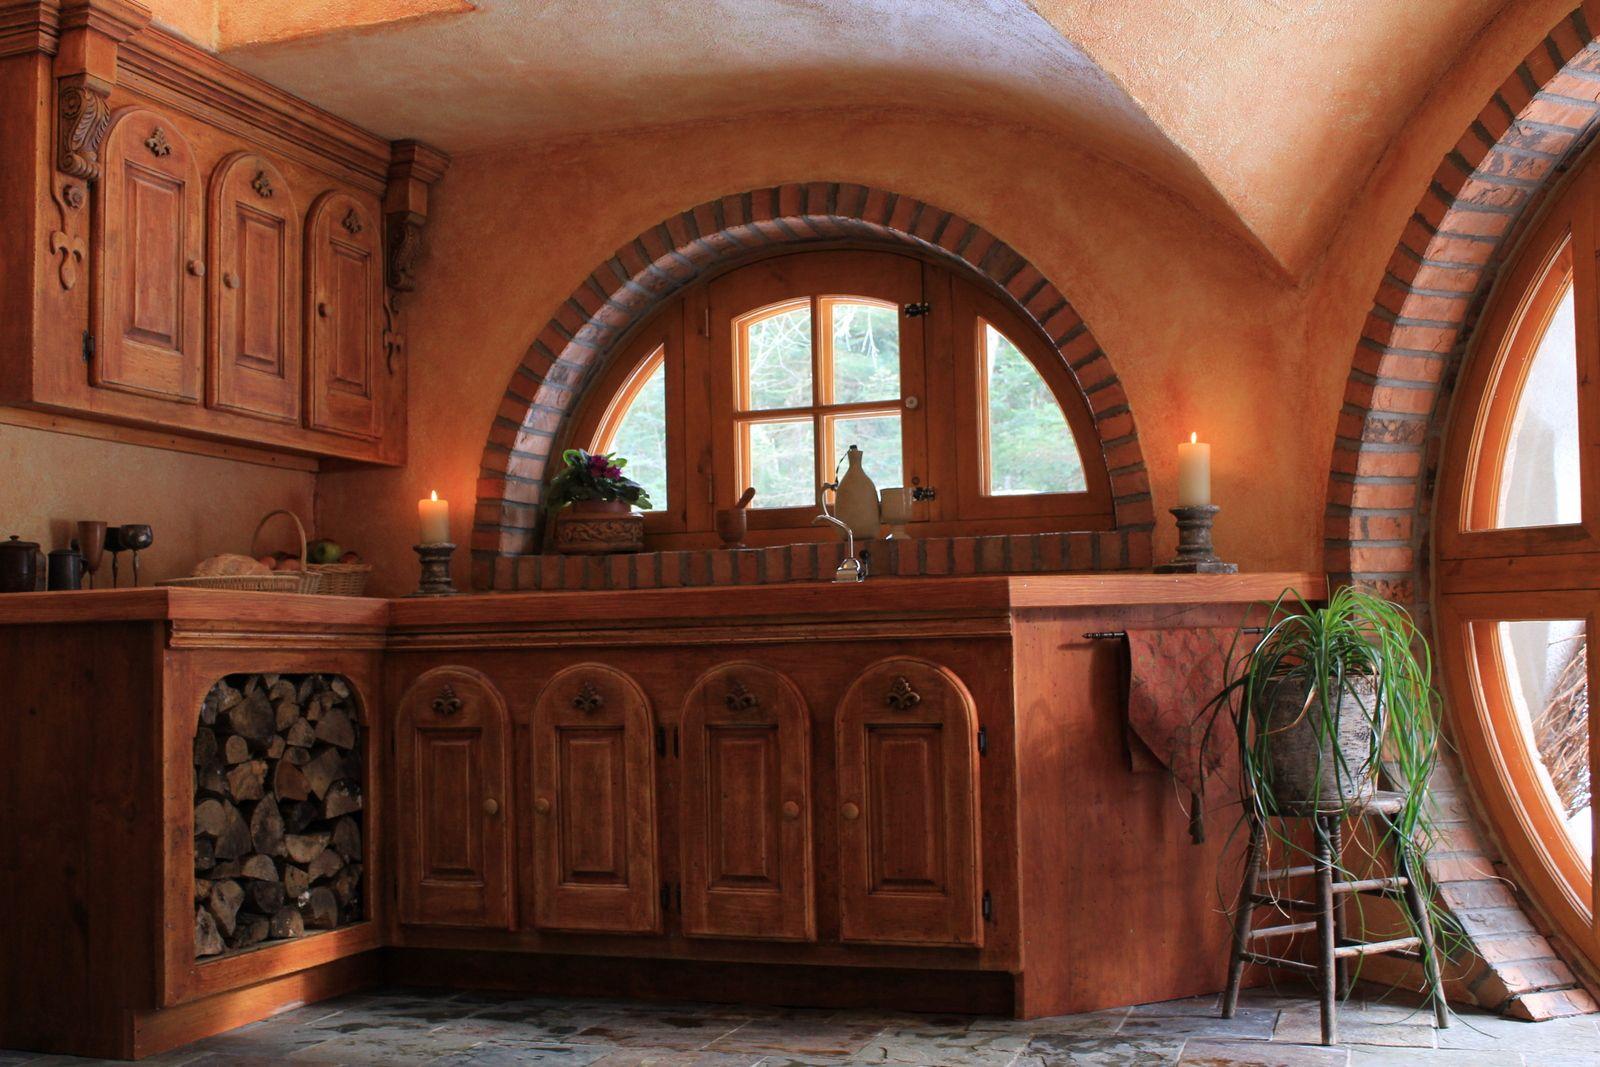 hobbit kitchen - i want one!   hobbit house, fairytale house